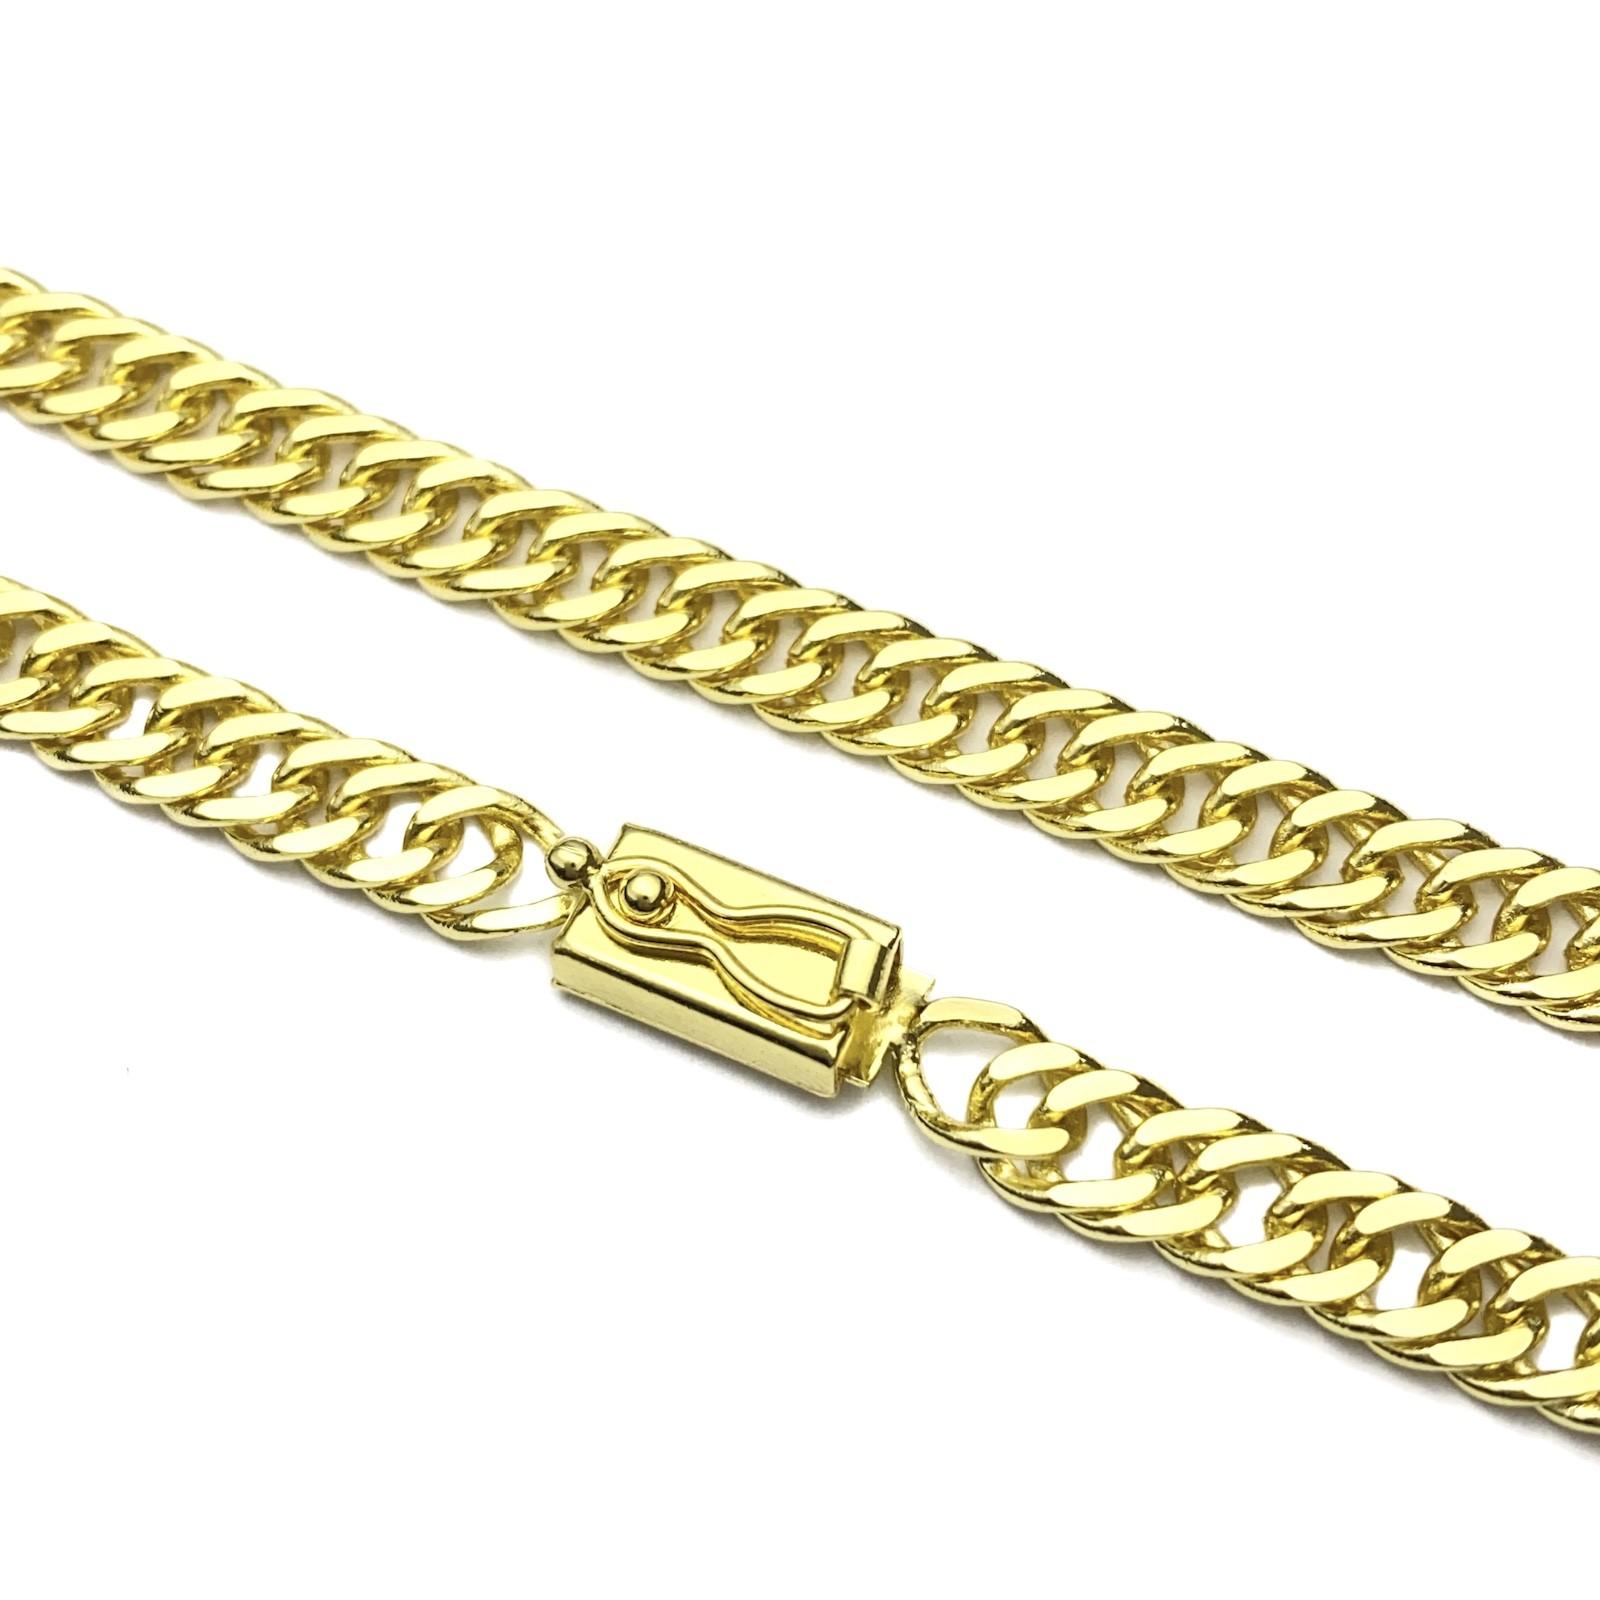 Pulseira Double Grumet 6mm 10g (Fecho Gaveta) (Banho Ouro 24k)